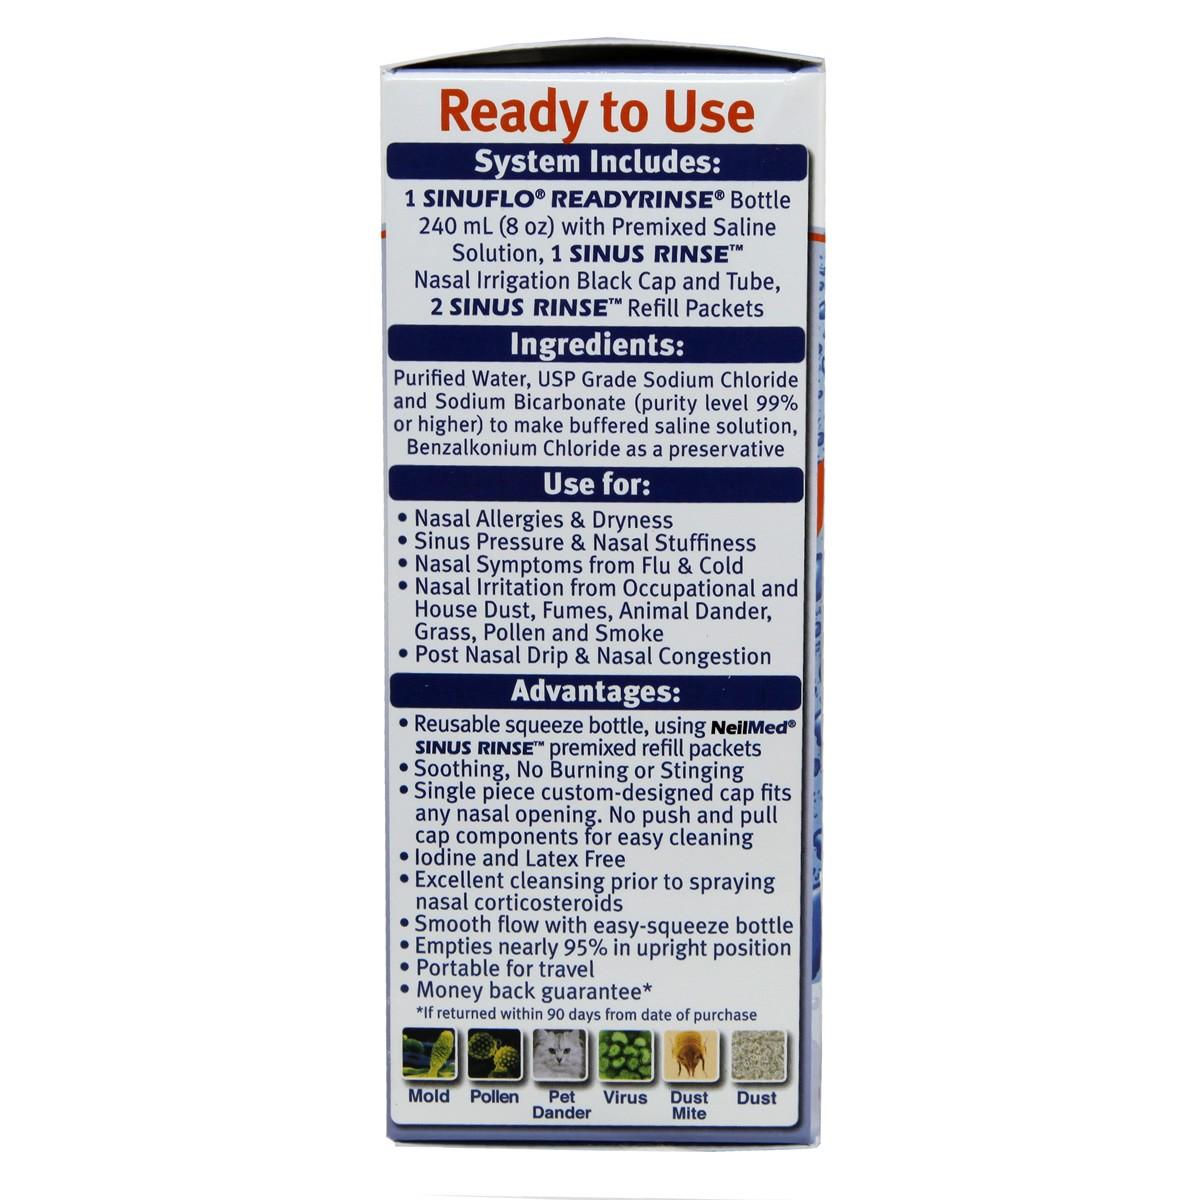 NeilMed SinuFlo Ready Rinse Premixed Nasal Wash